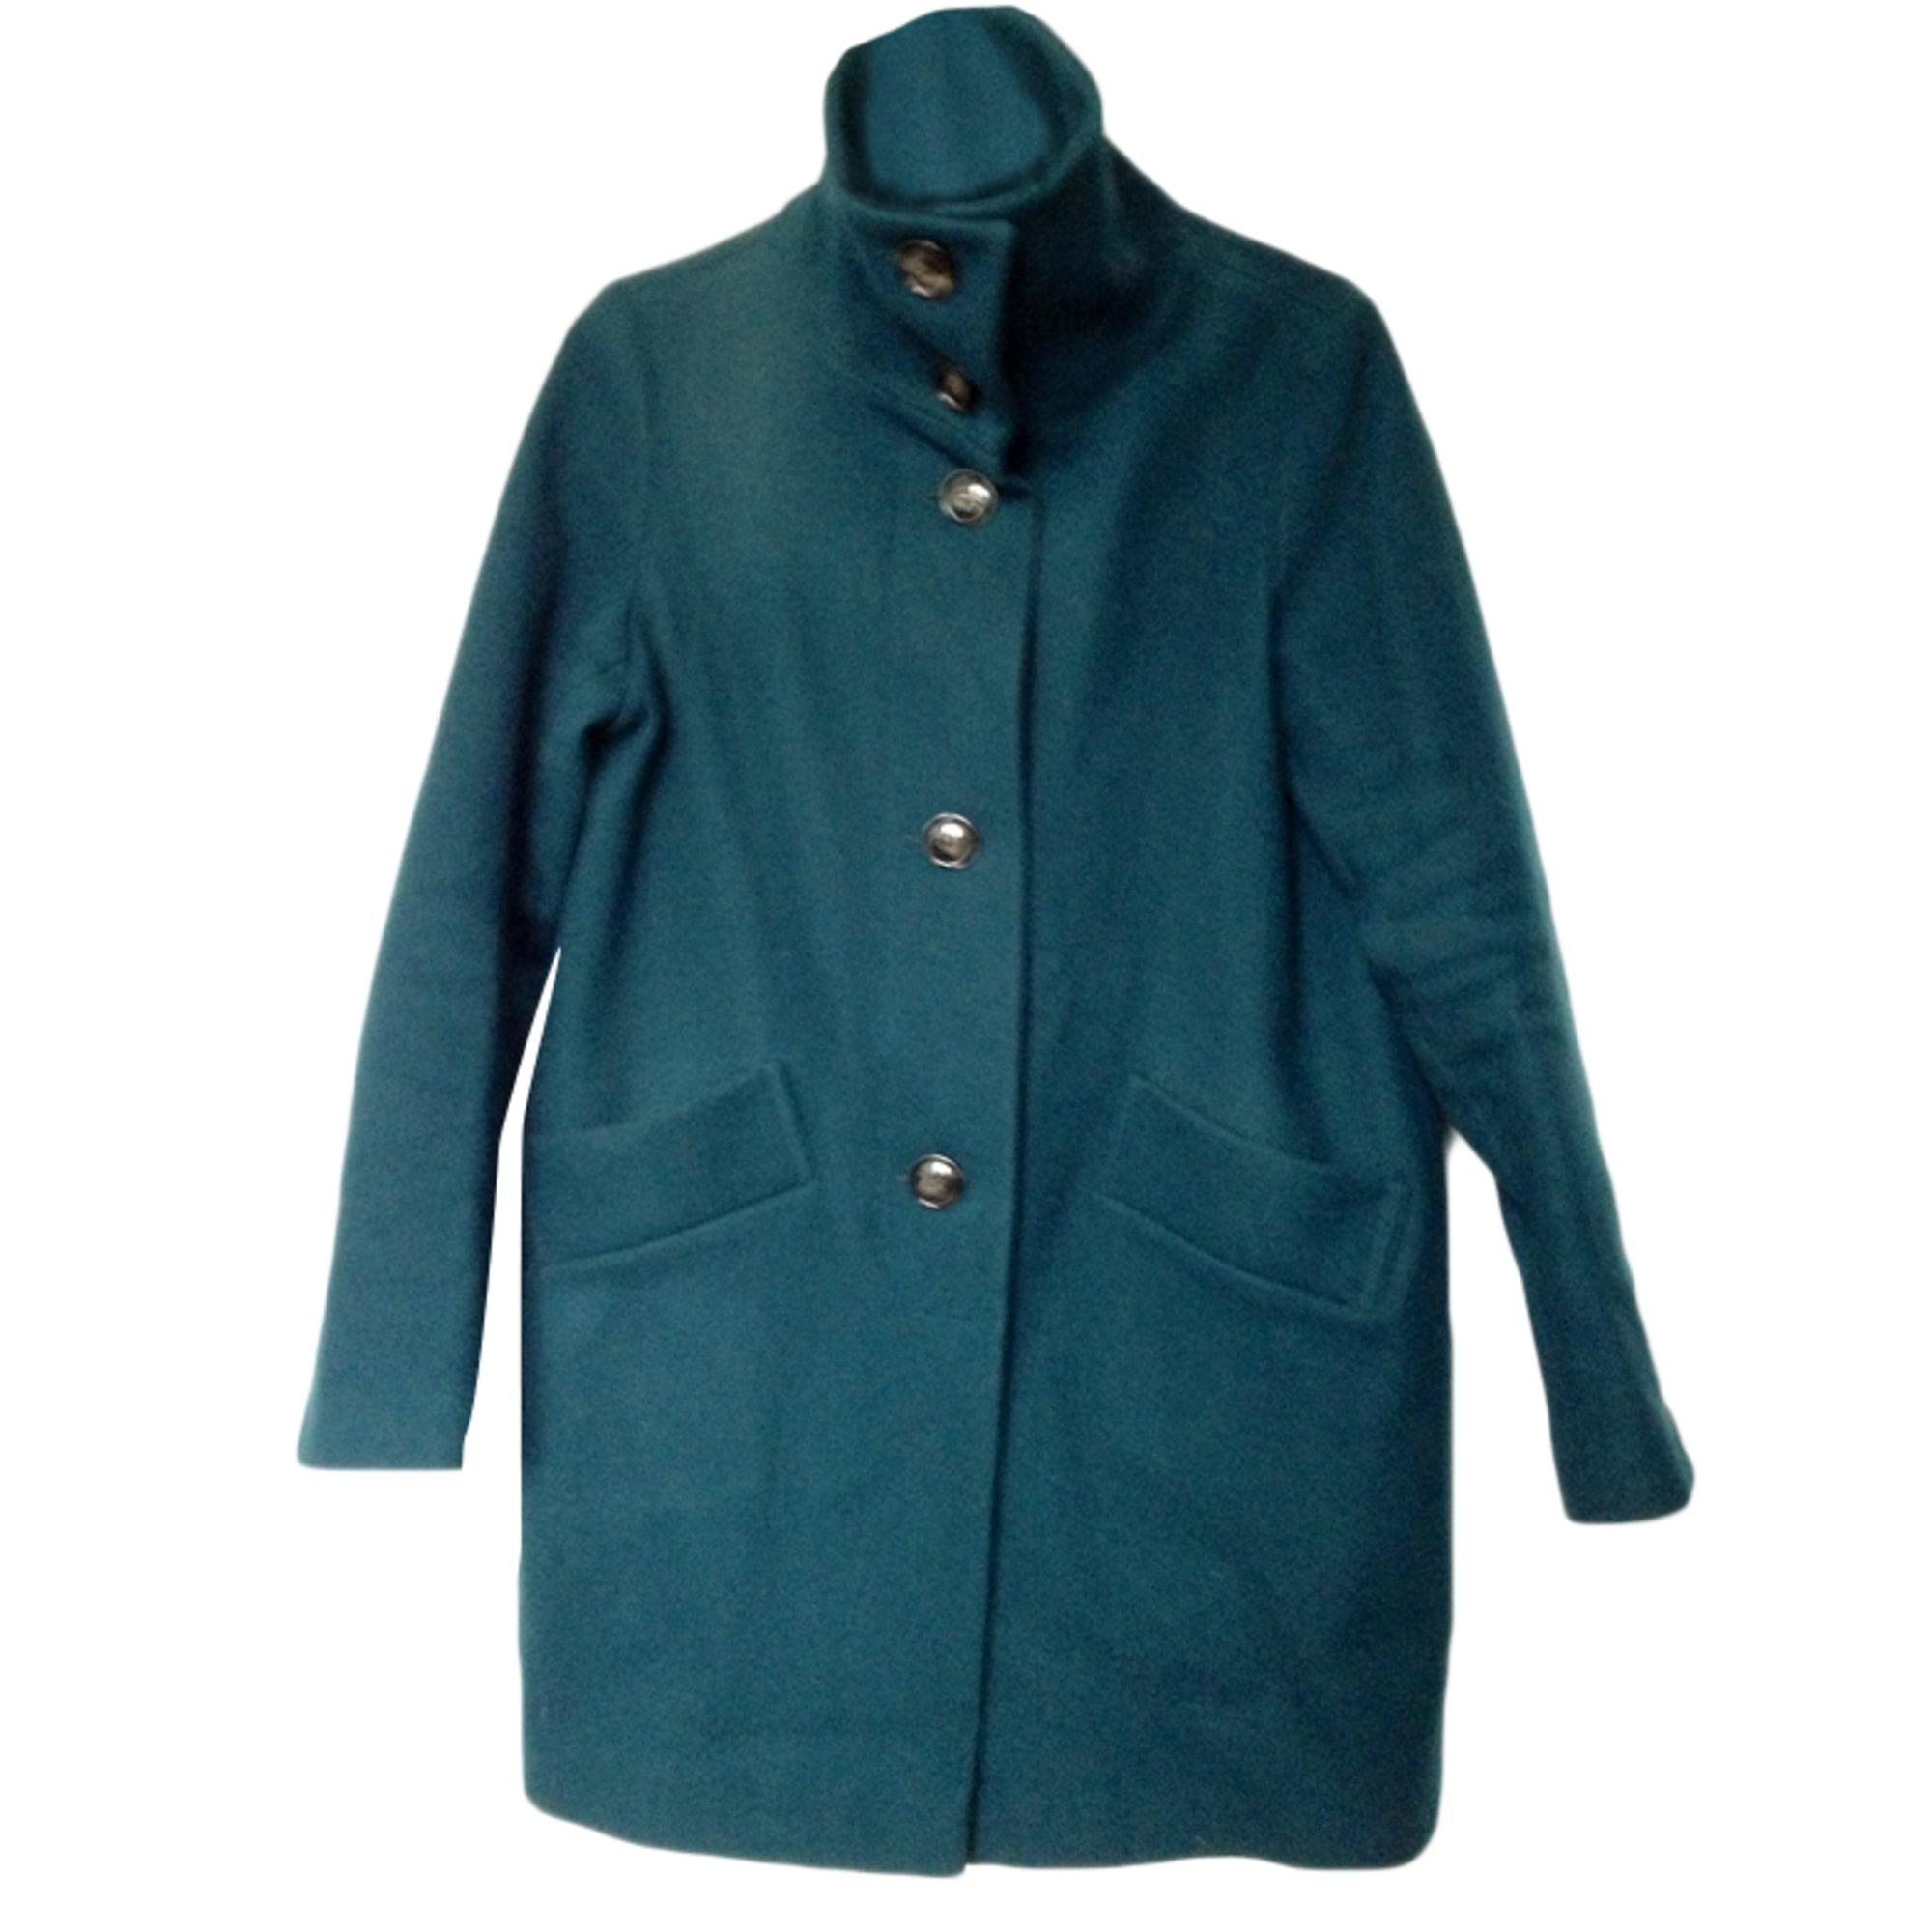 manteau bleu canard avec sac